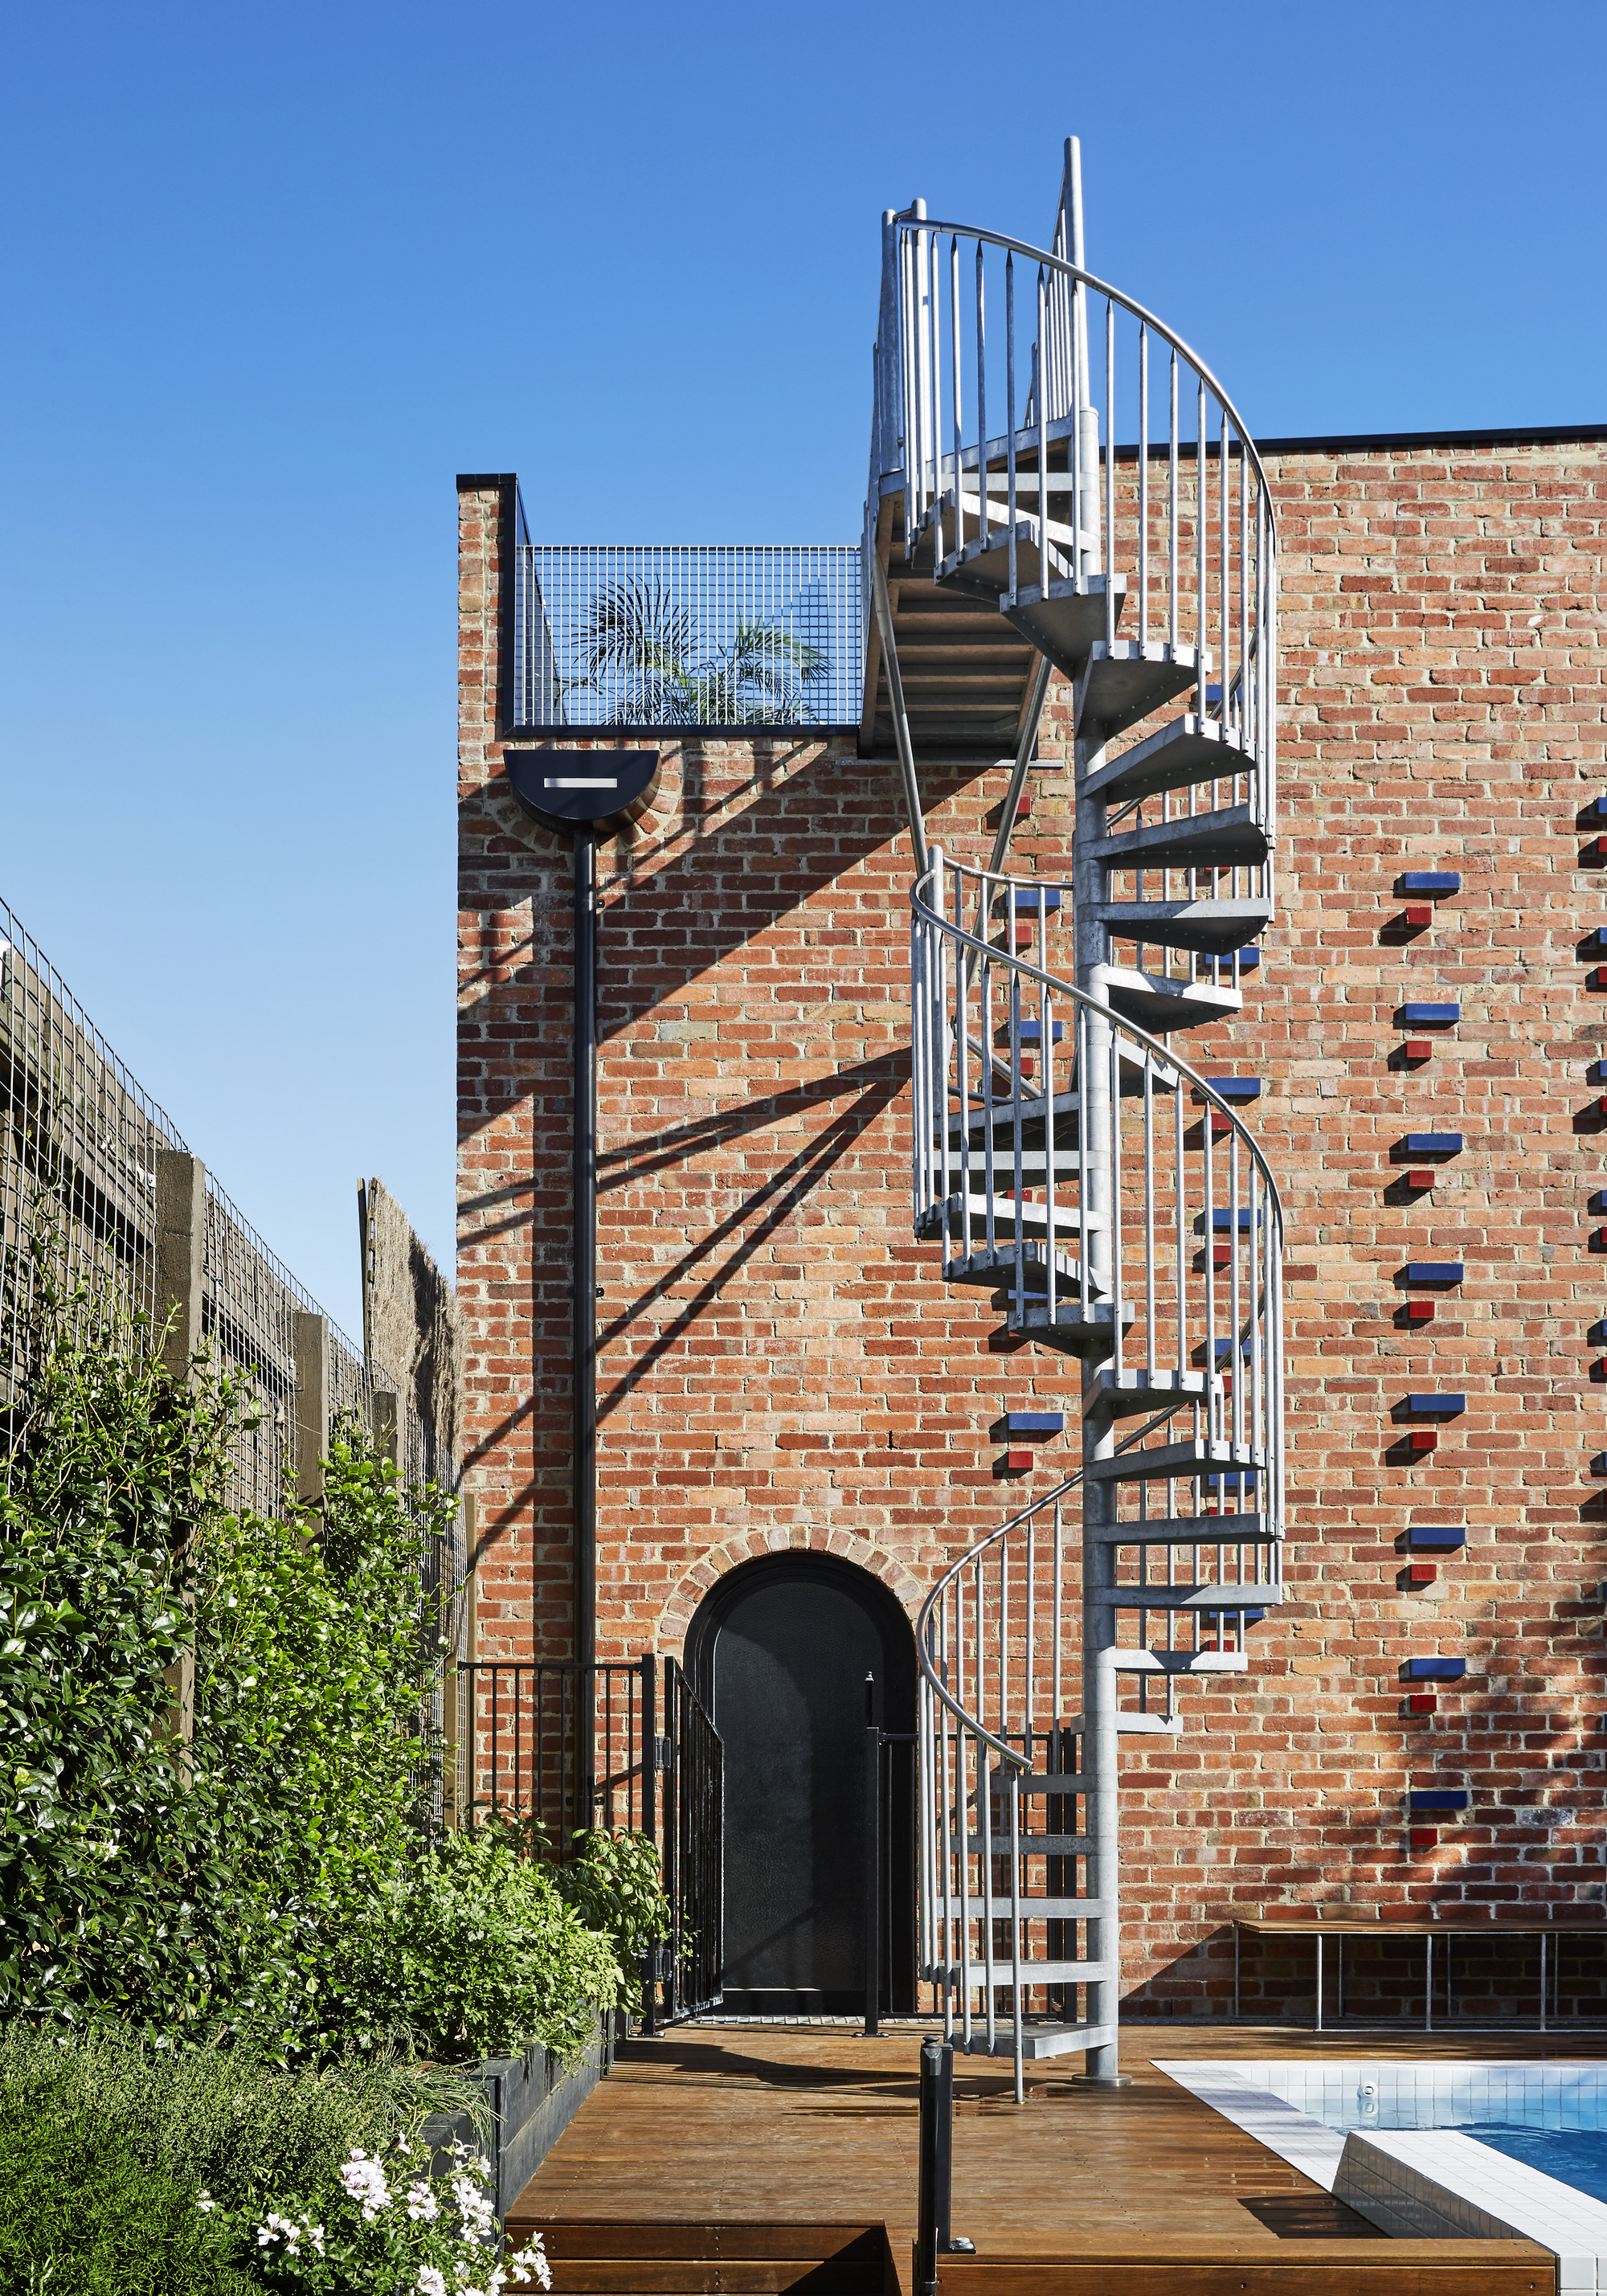 Garden State Brickface And Stucco Designs